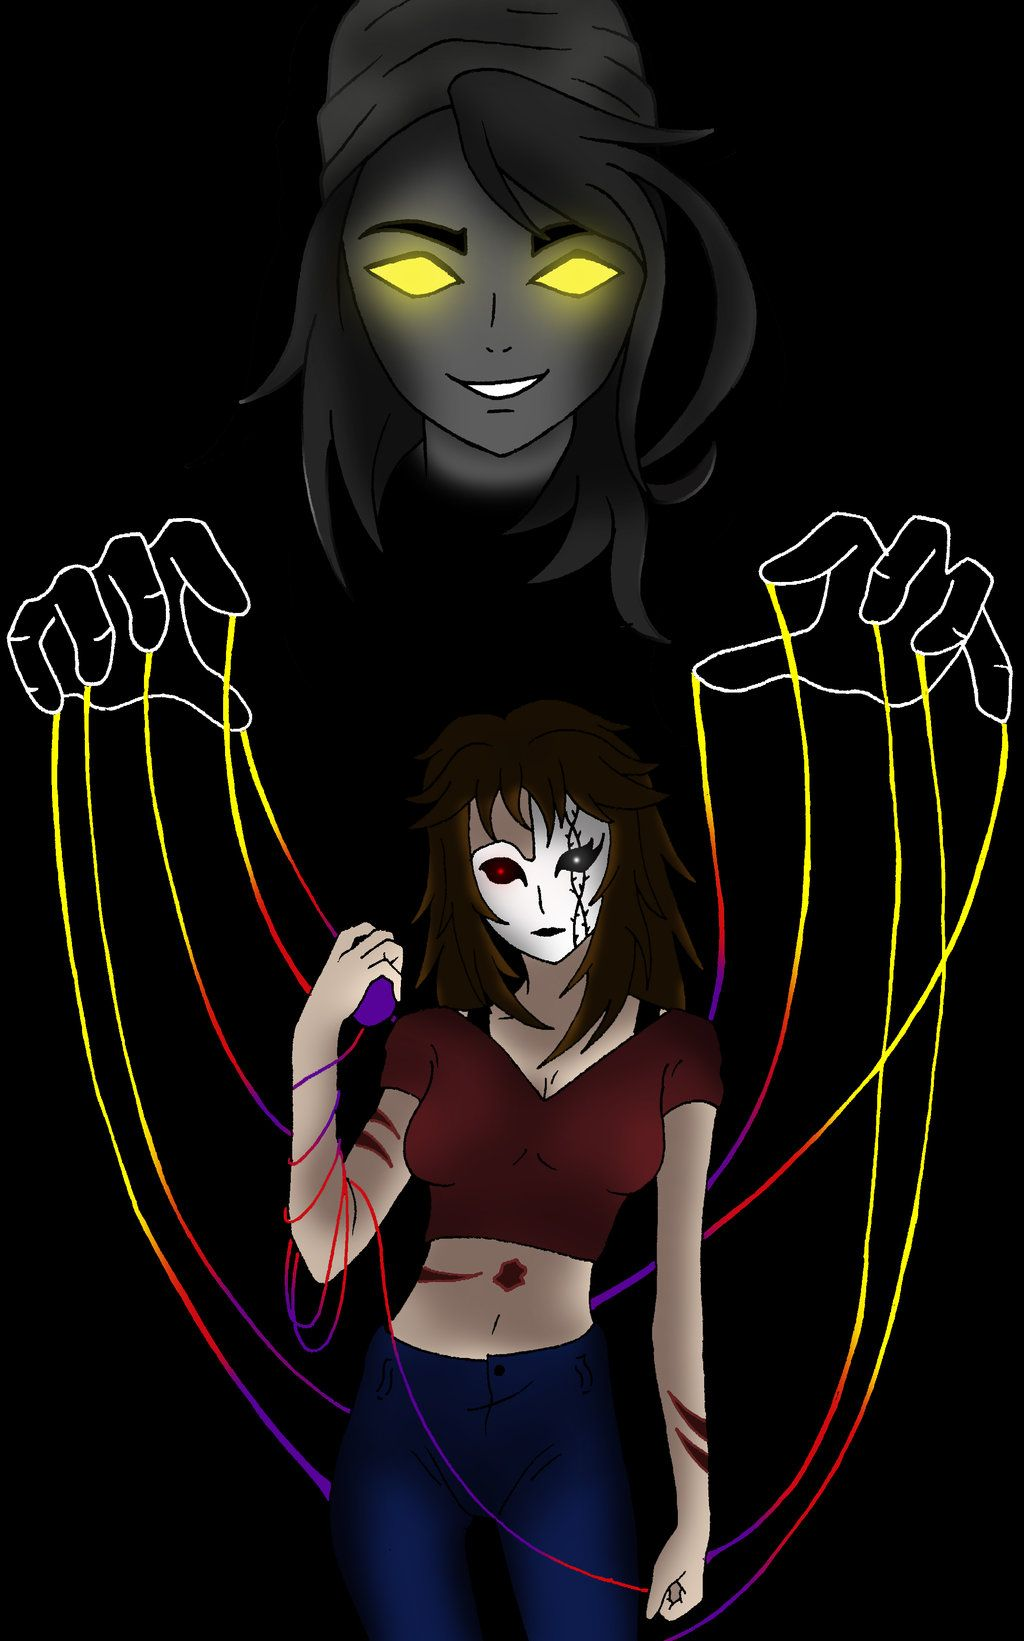 Creepypasta: Dark Nemesis by darkangel6021 on DeviantArt | Nemesis | Pinterest | Creepypasta